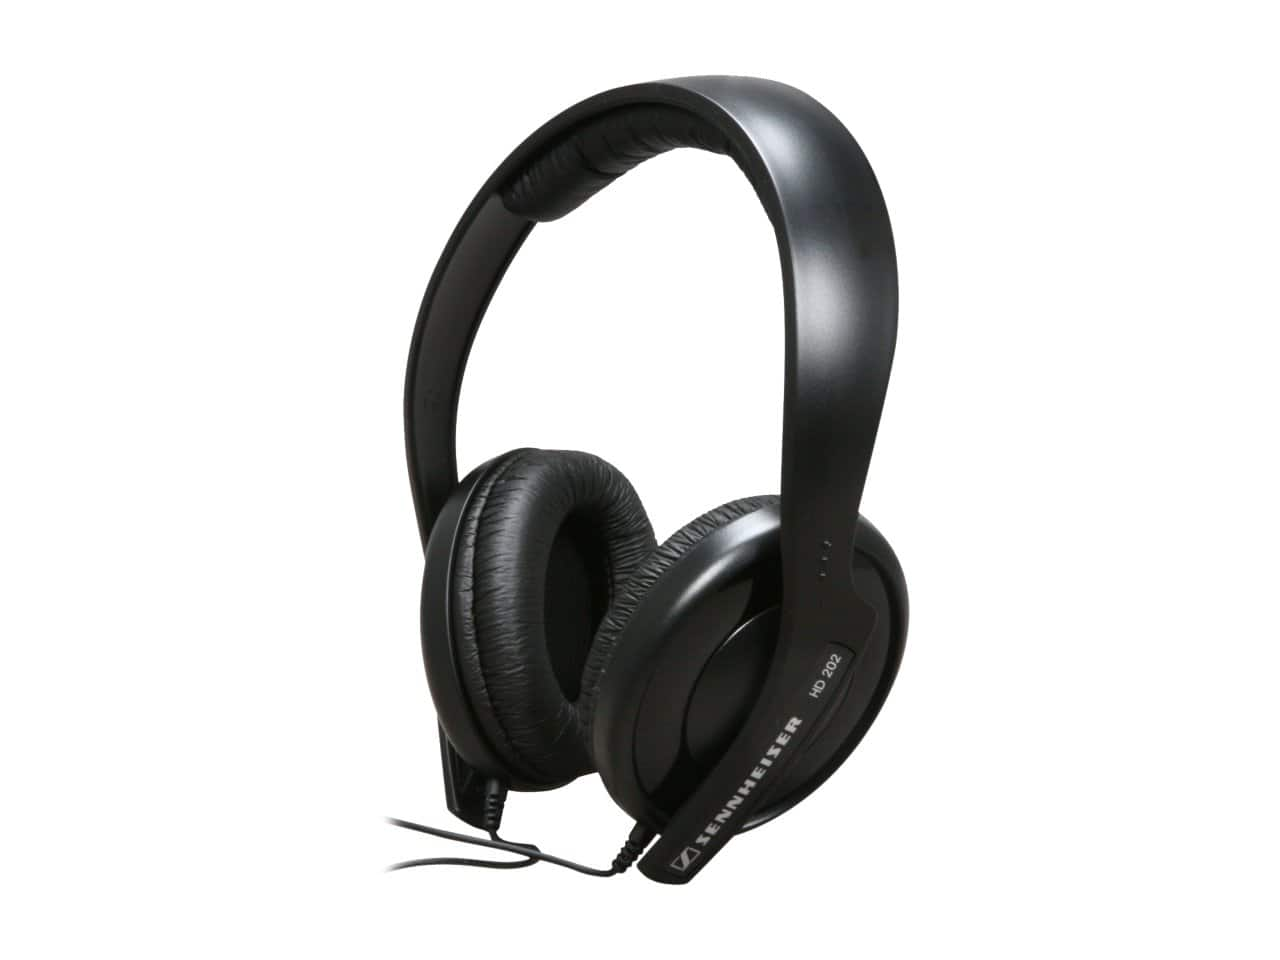 Personal Audio: Sennheiser HD-202II On-Ear Professional DJ Style Headphones for $14.95 AC & More + Free Shipping @ Newegg.com